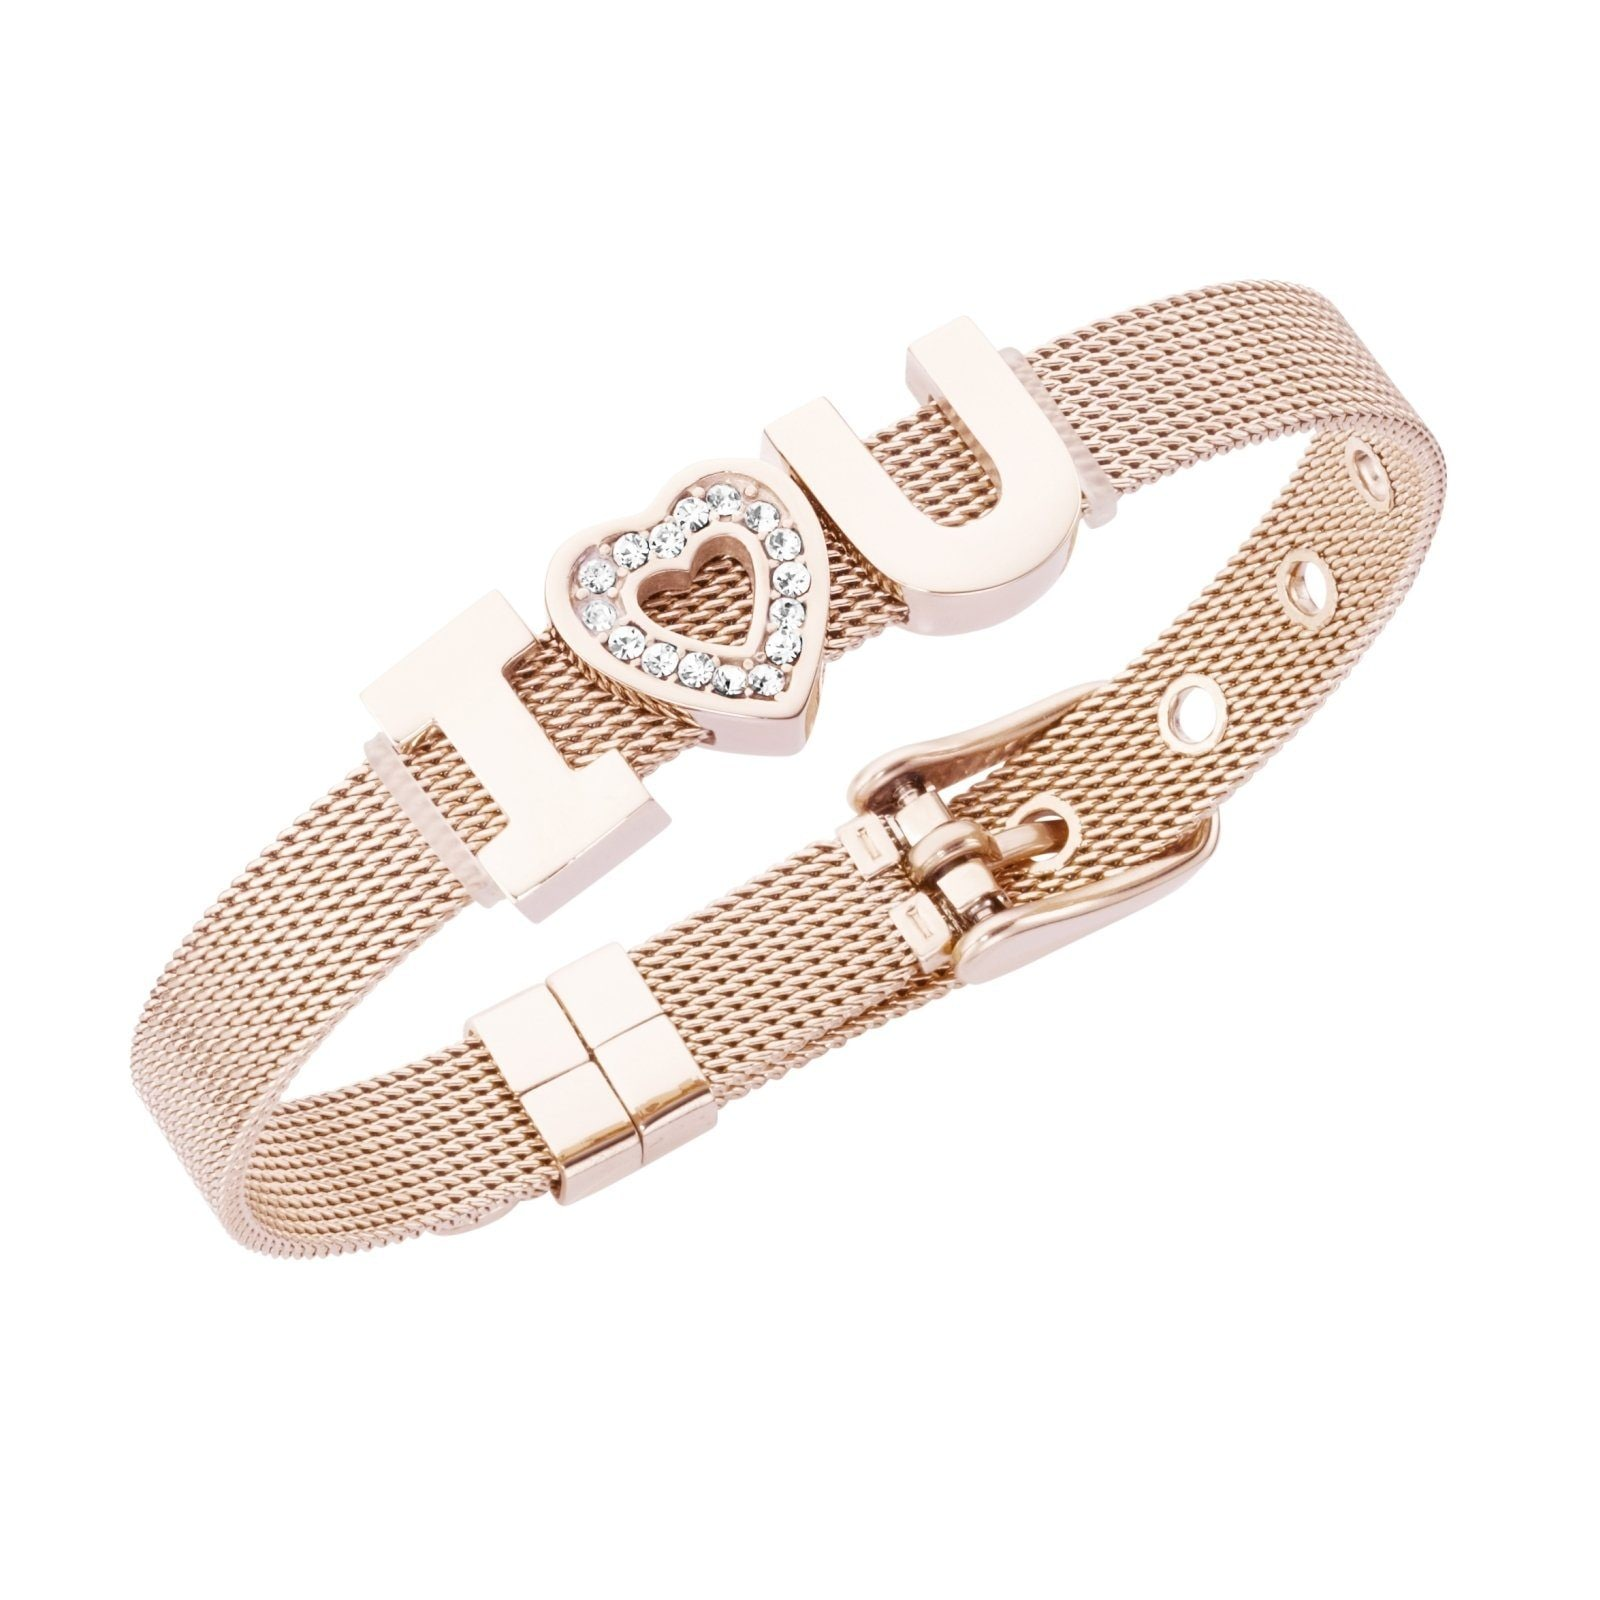 Jacques Charrel Armband Milanaise mit Kristallsteinen I Love You rosa Damen Armbänder Schmuck